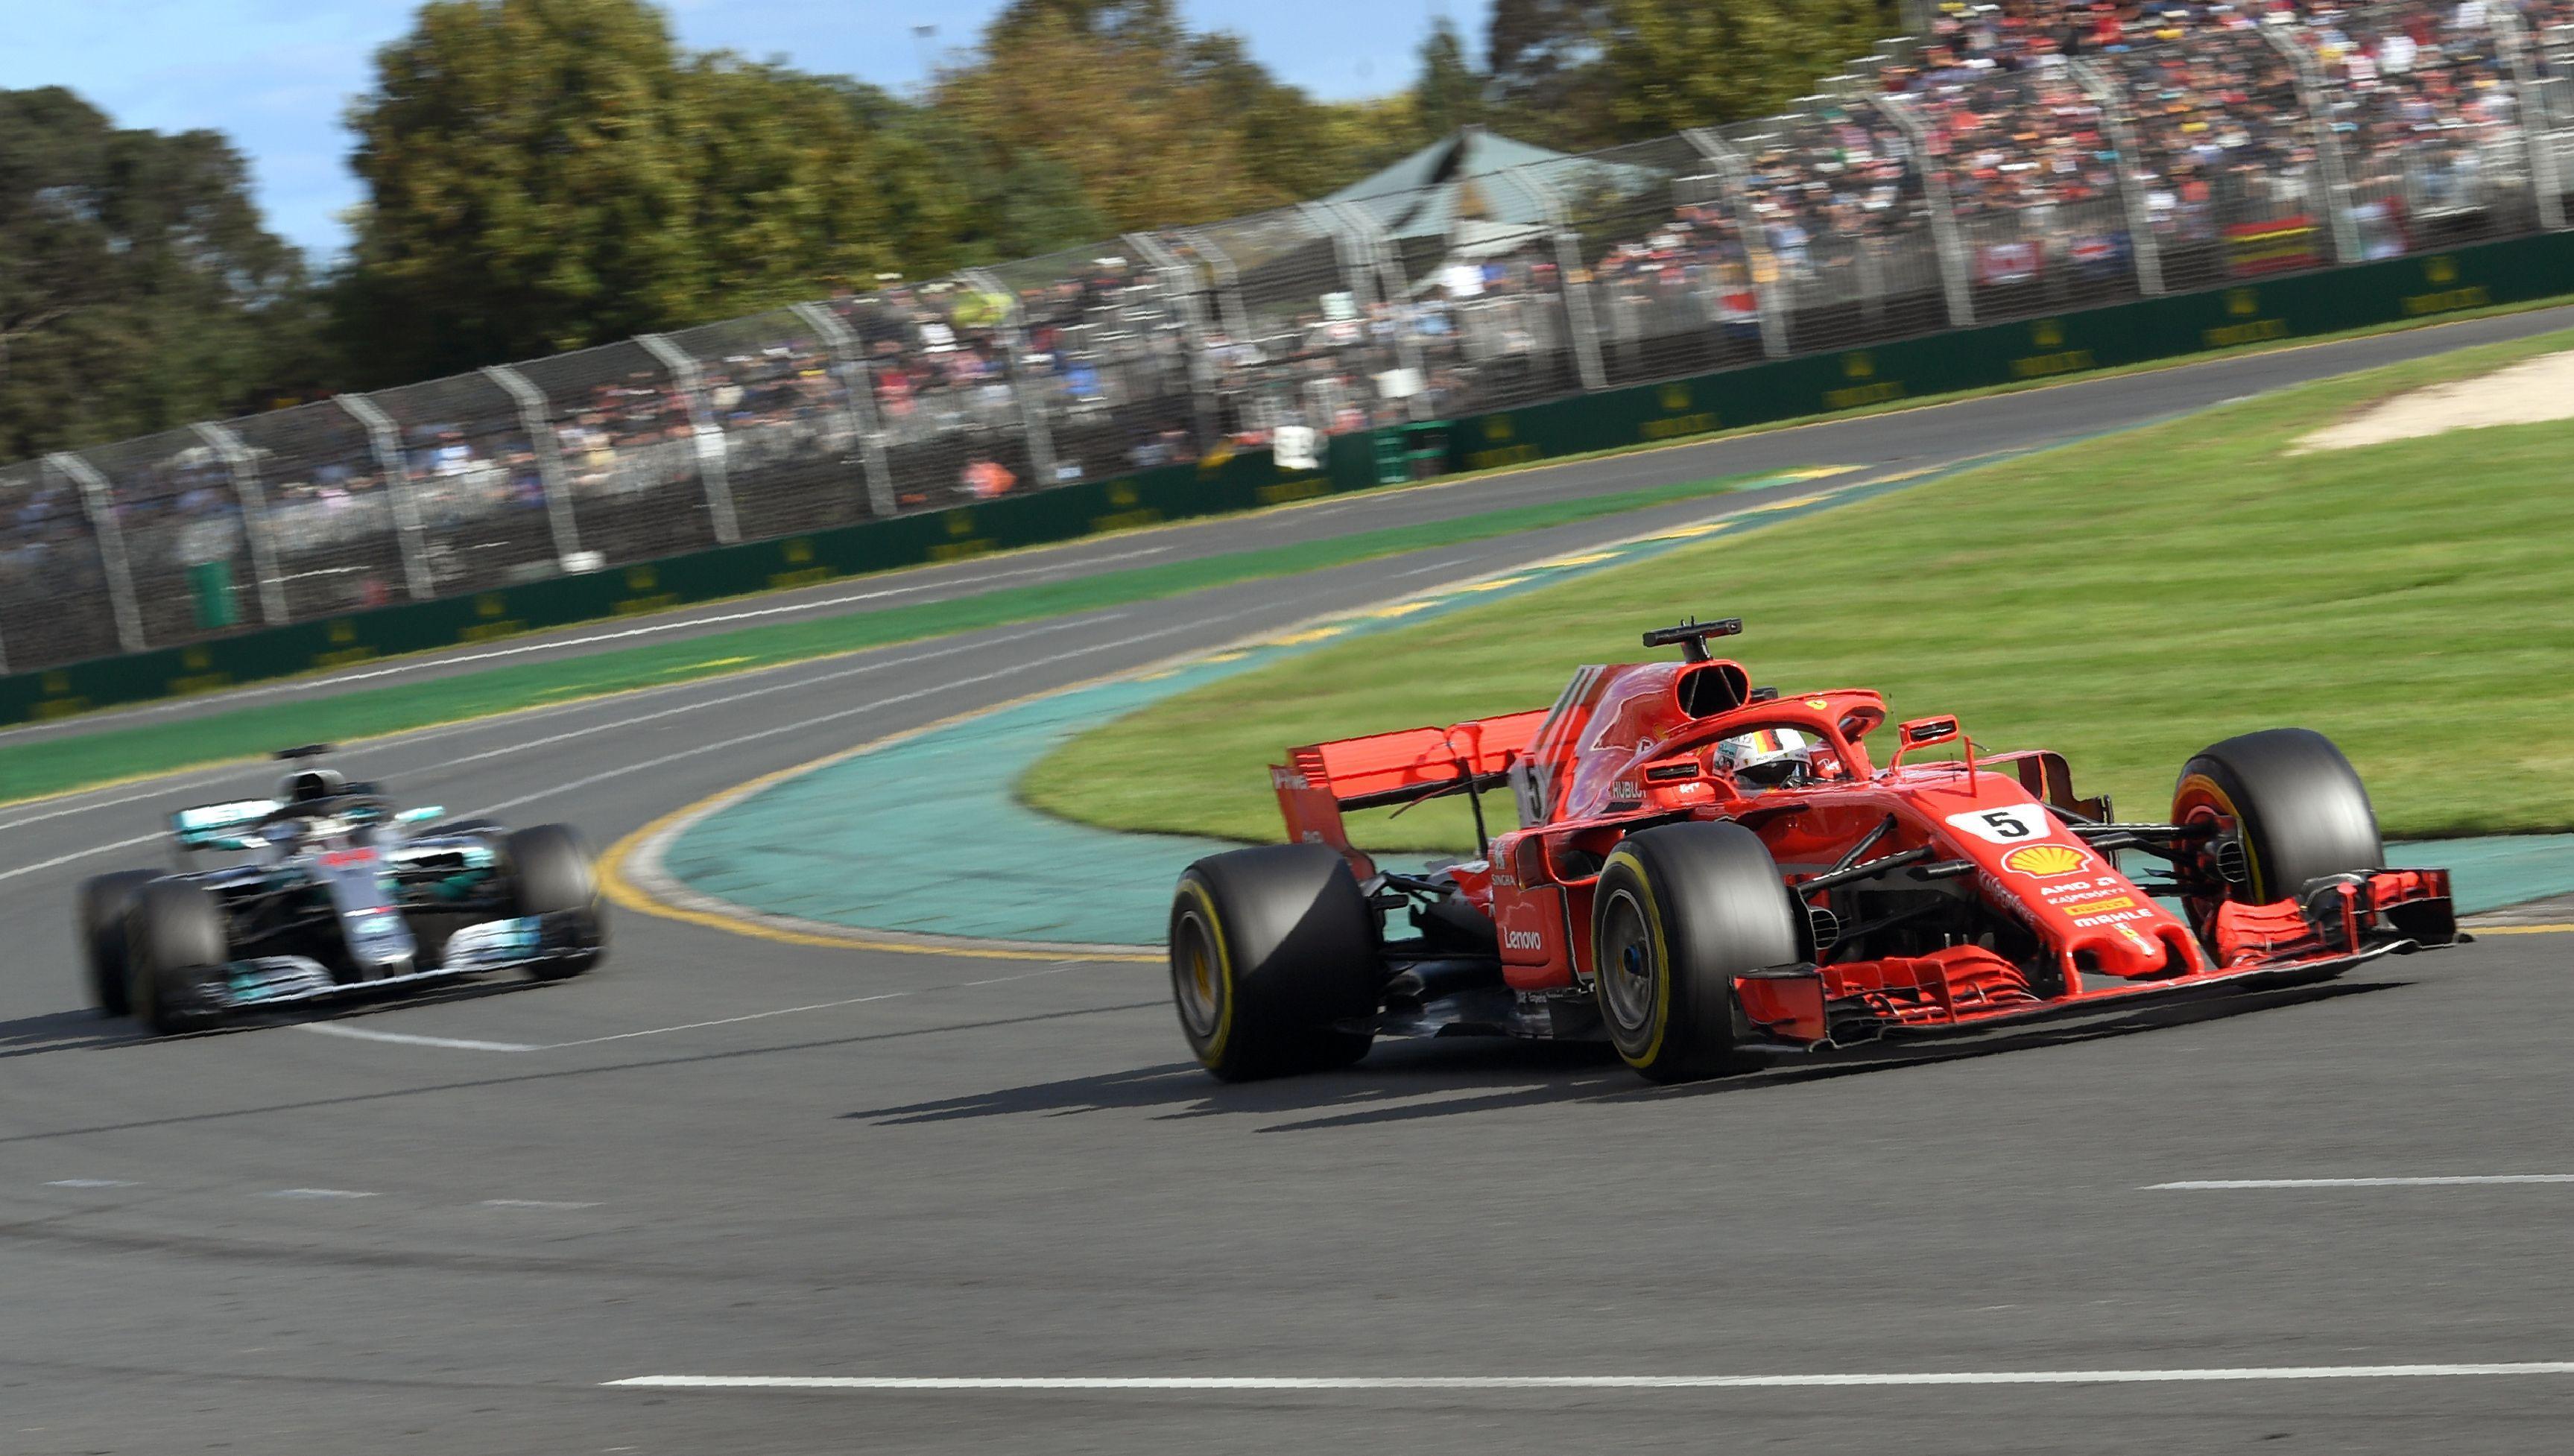 Sebastian Vettel held off Lewis Hamilton to win the F1 season opener